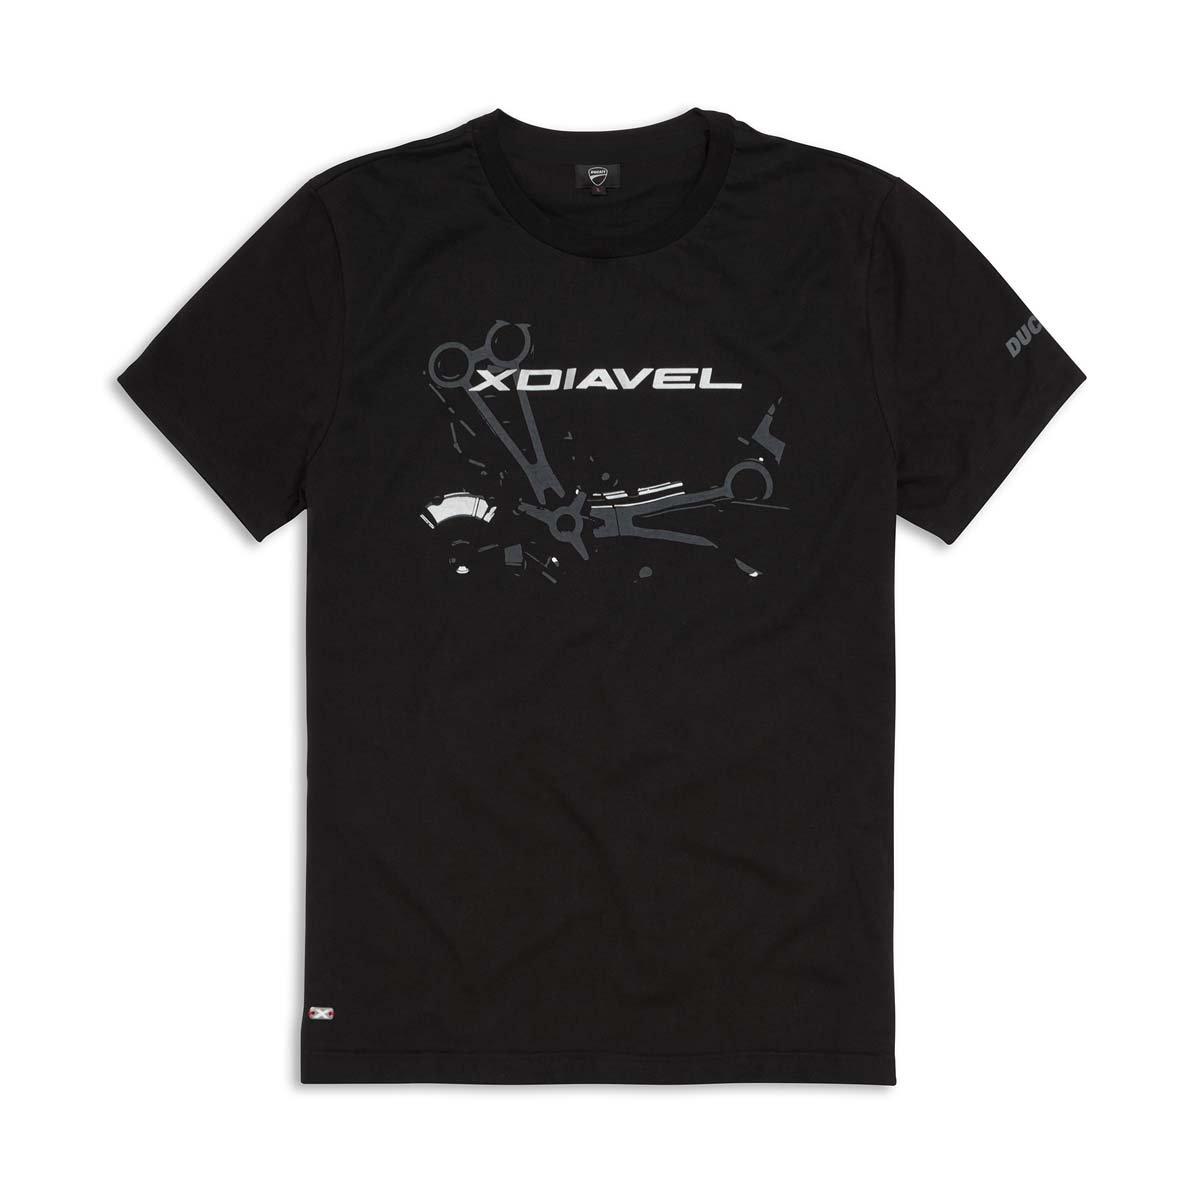 Ducati Iron Dream T-shirt Size Medium